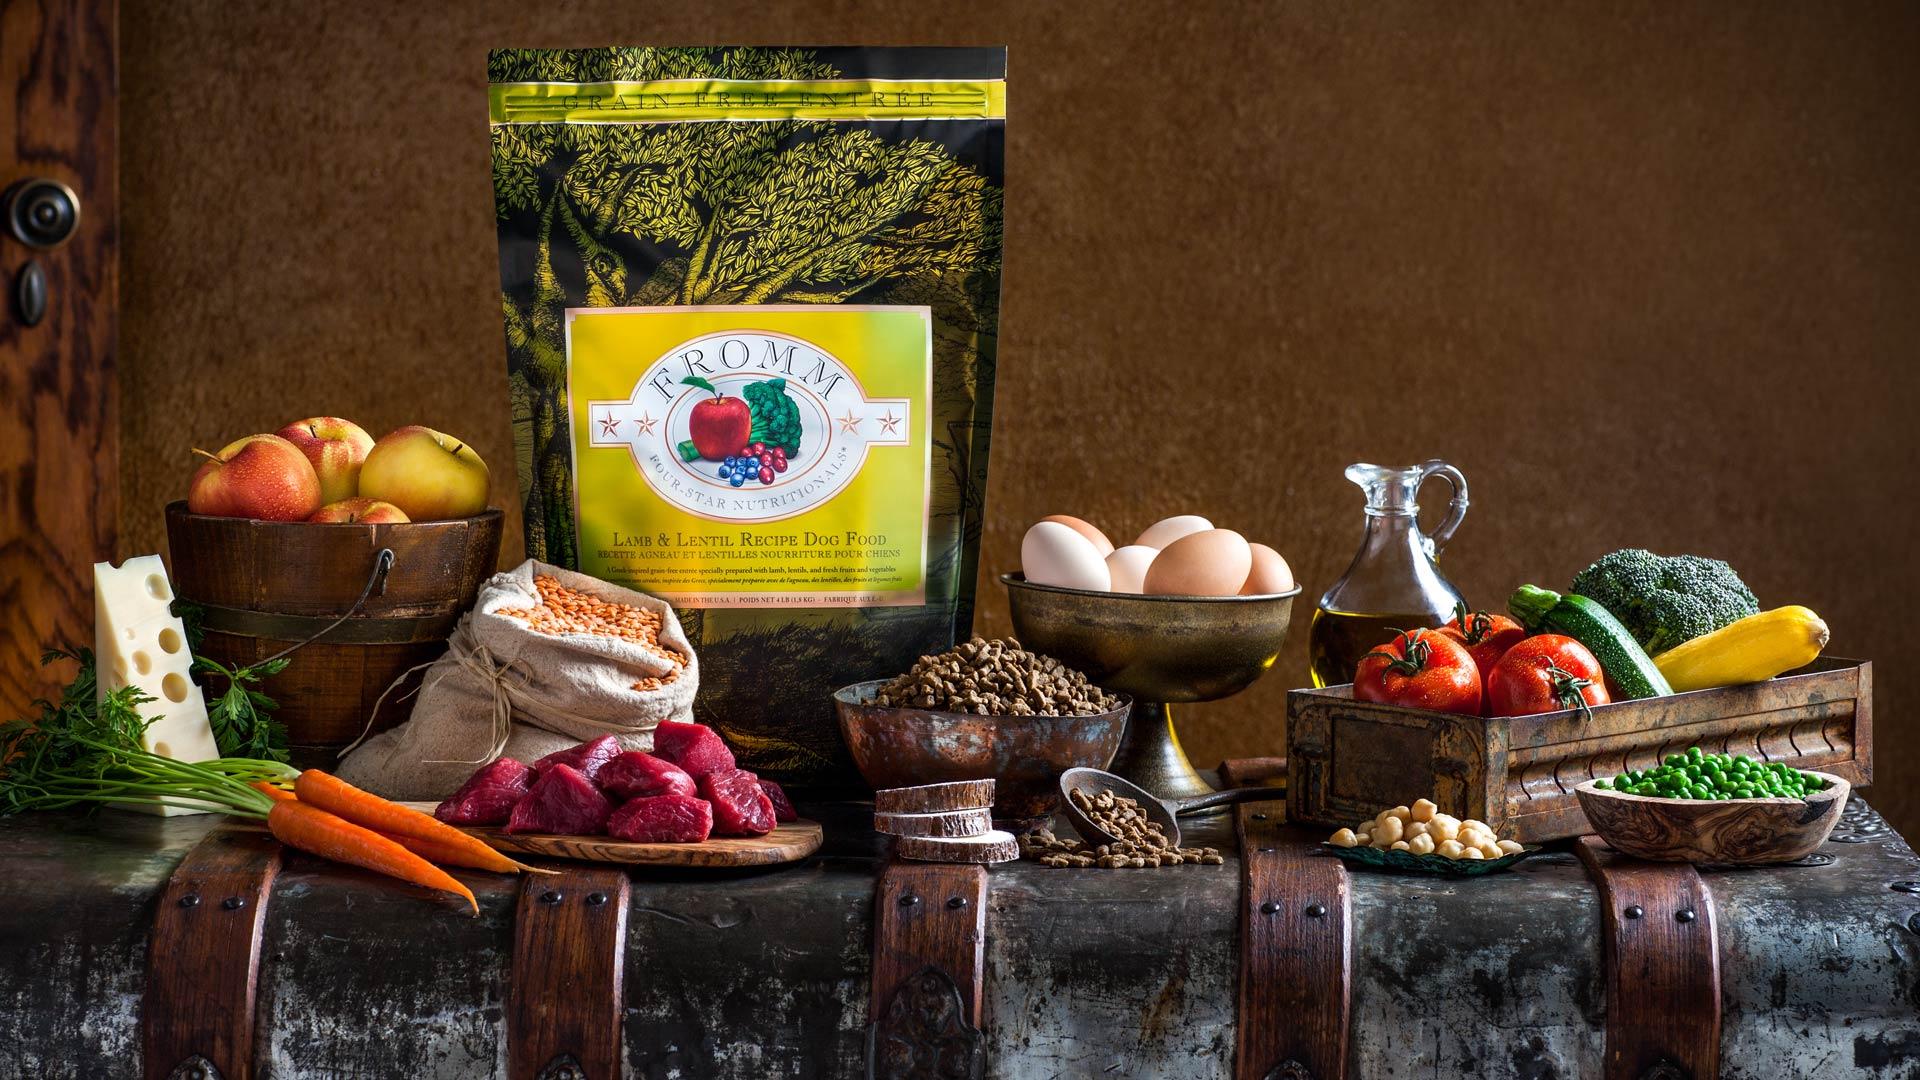 Lamb and Lentil Recipe Dog Food